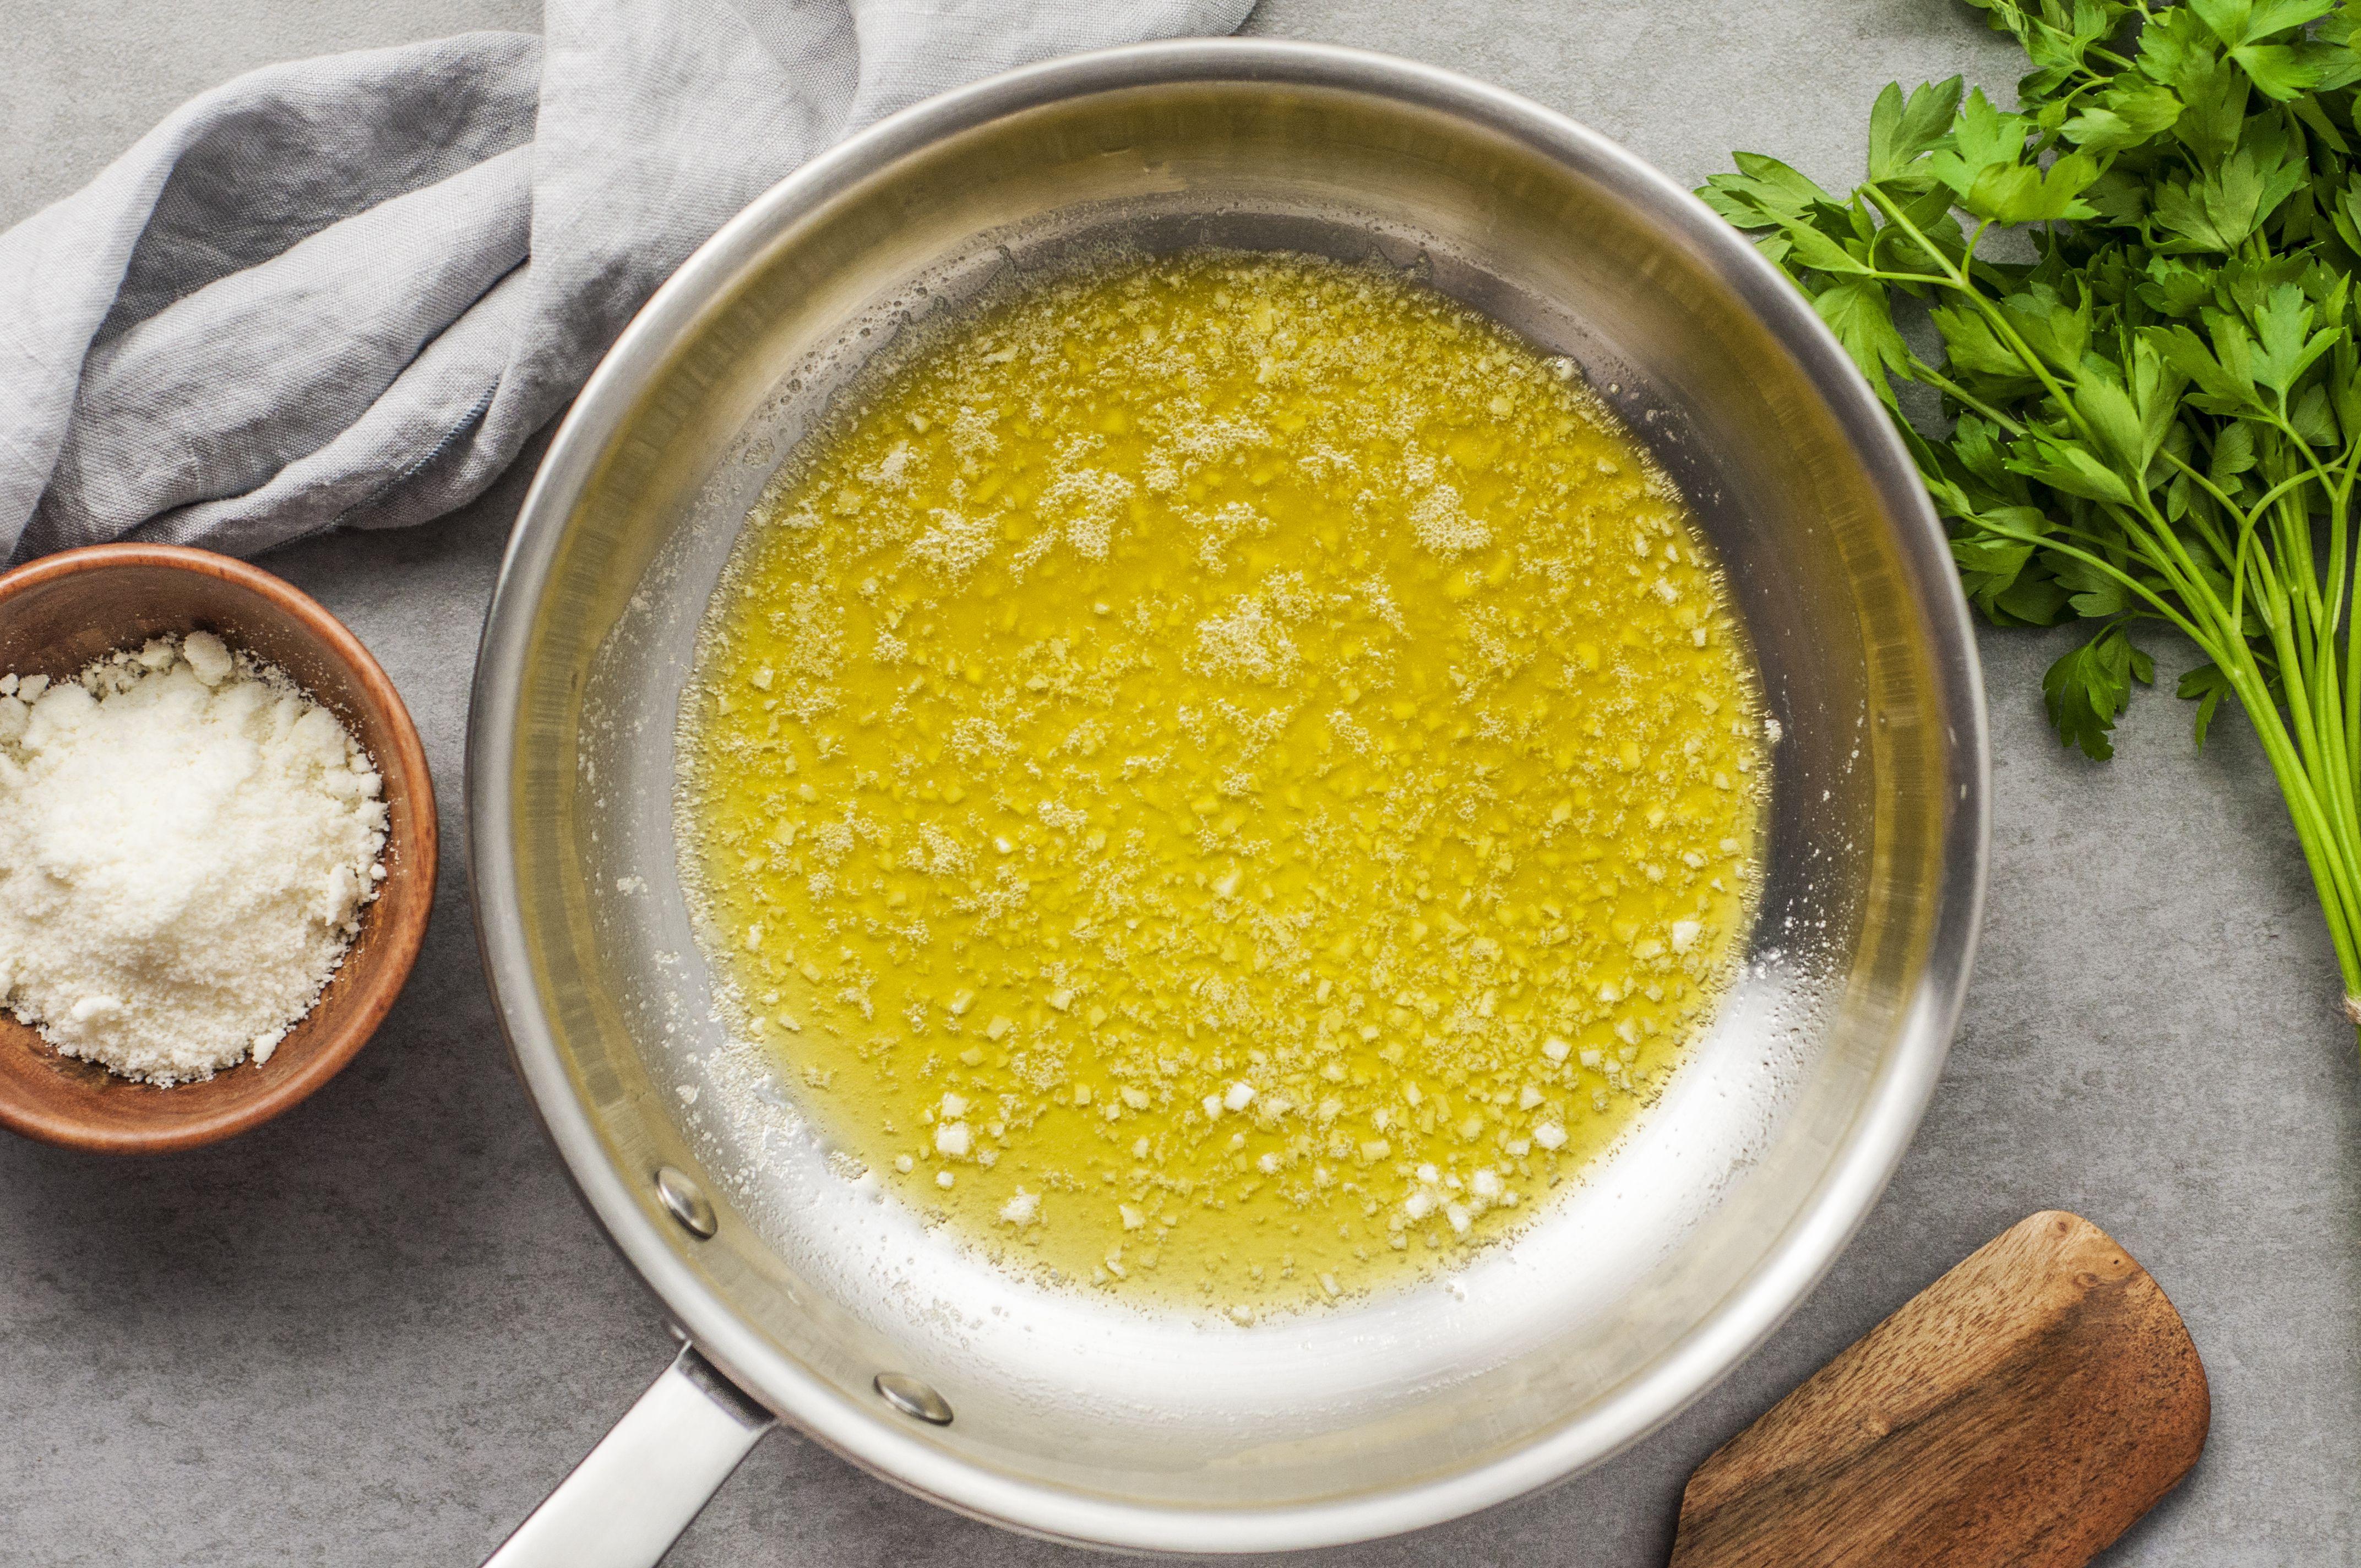 Olive oil, butter in garlic in frying pan